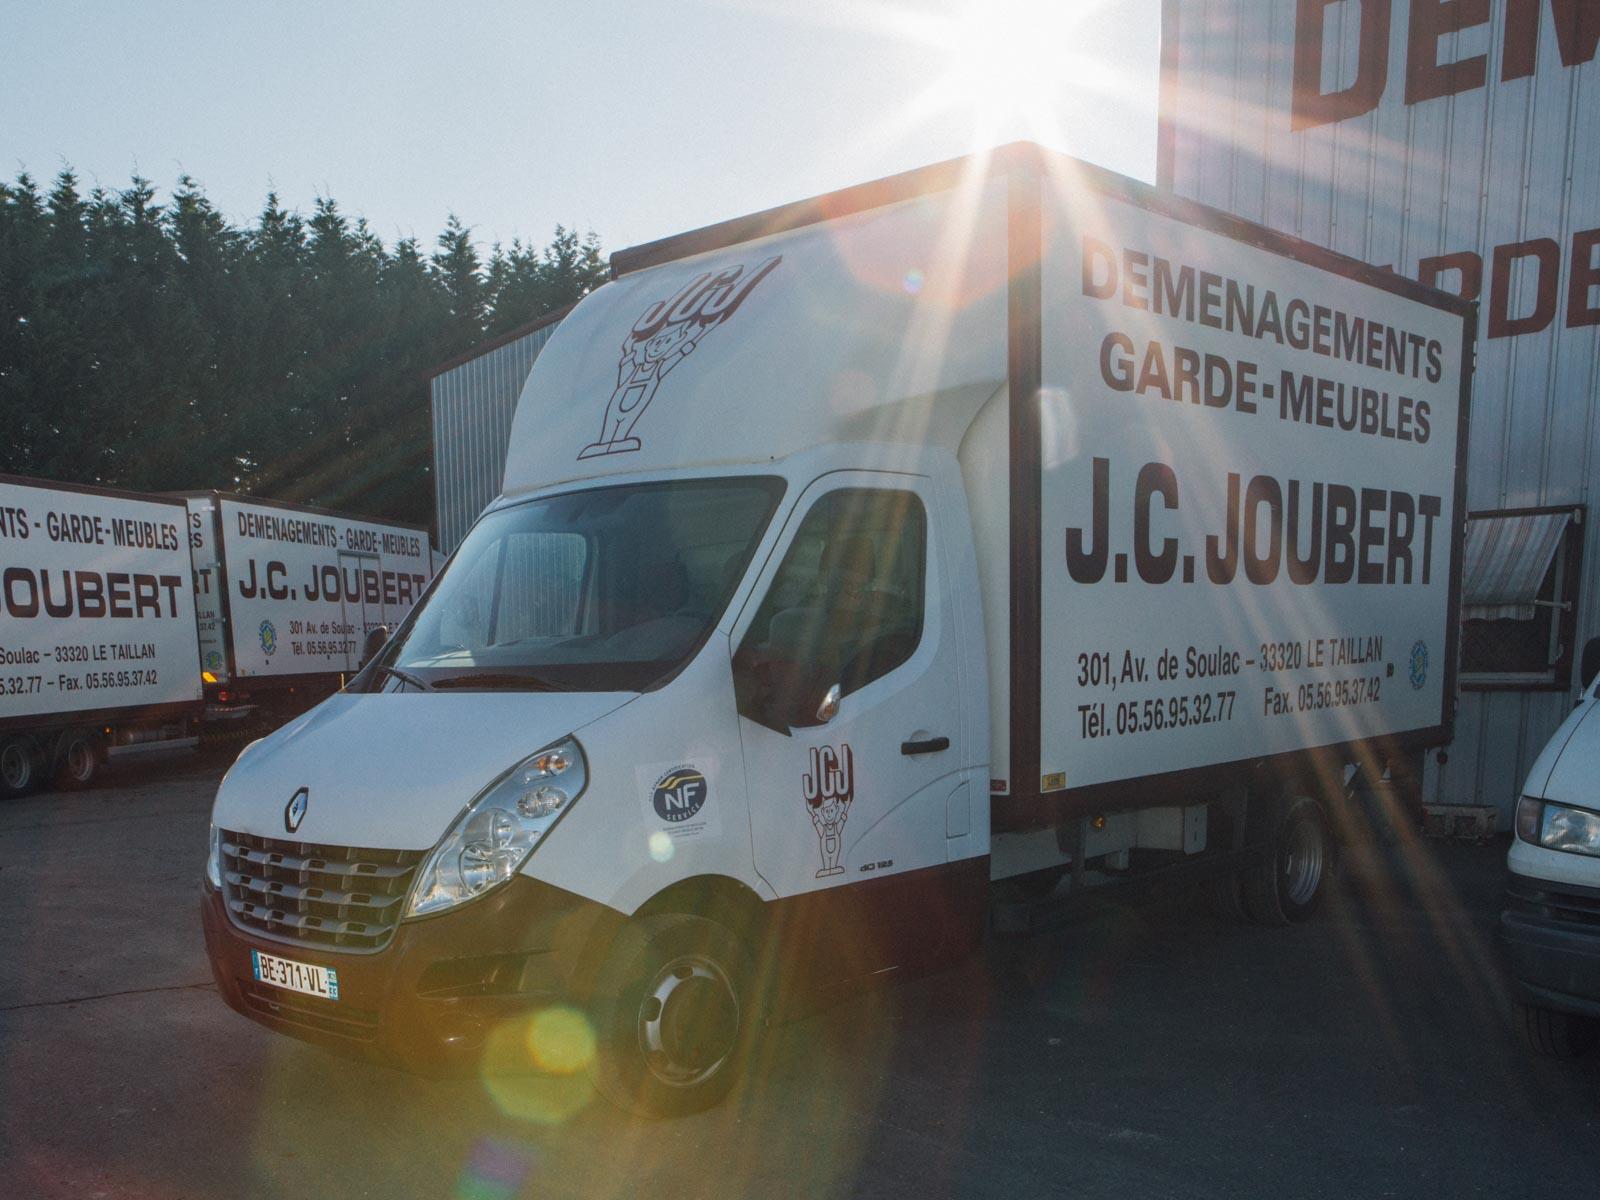 Camion JC Joubert